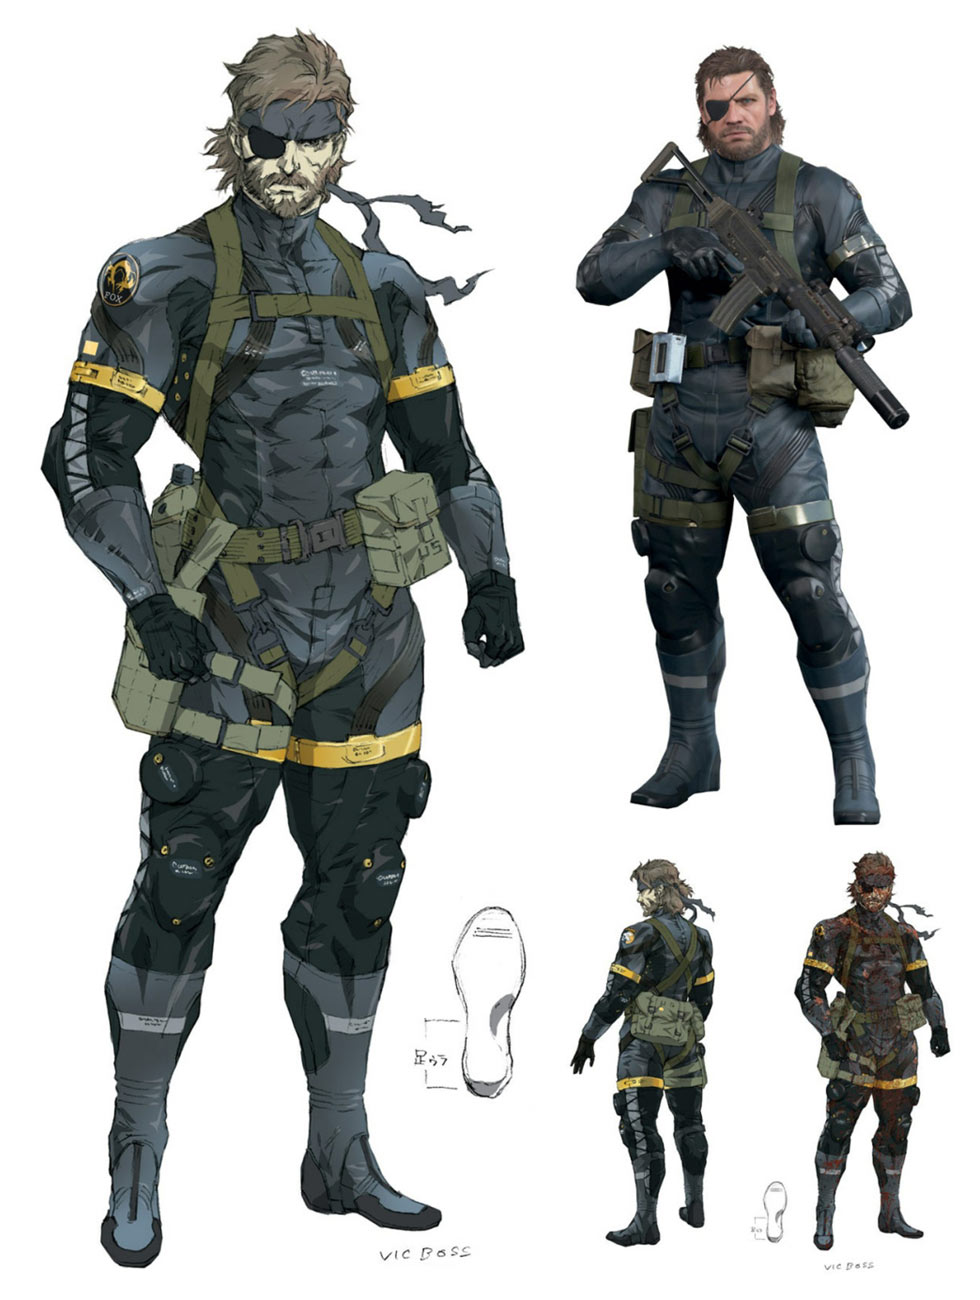 Snake Concept Art Metal Gear Solid V Art Gallery In 2020 Snake Metal Gear Metal Gear Solid Metal Gear